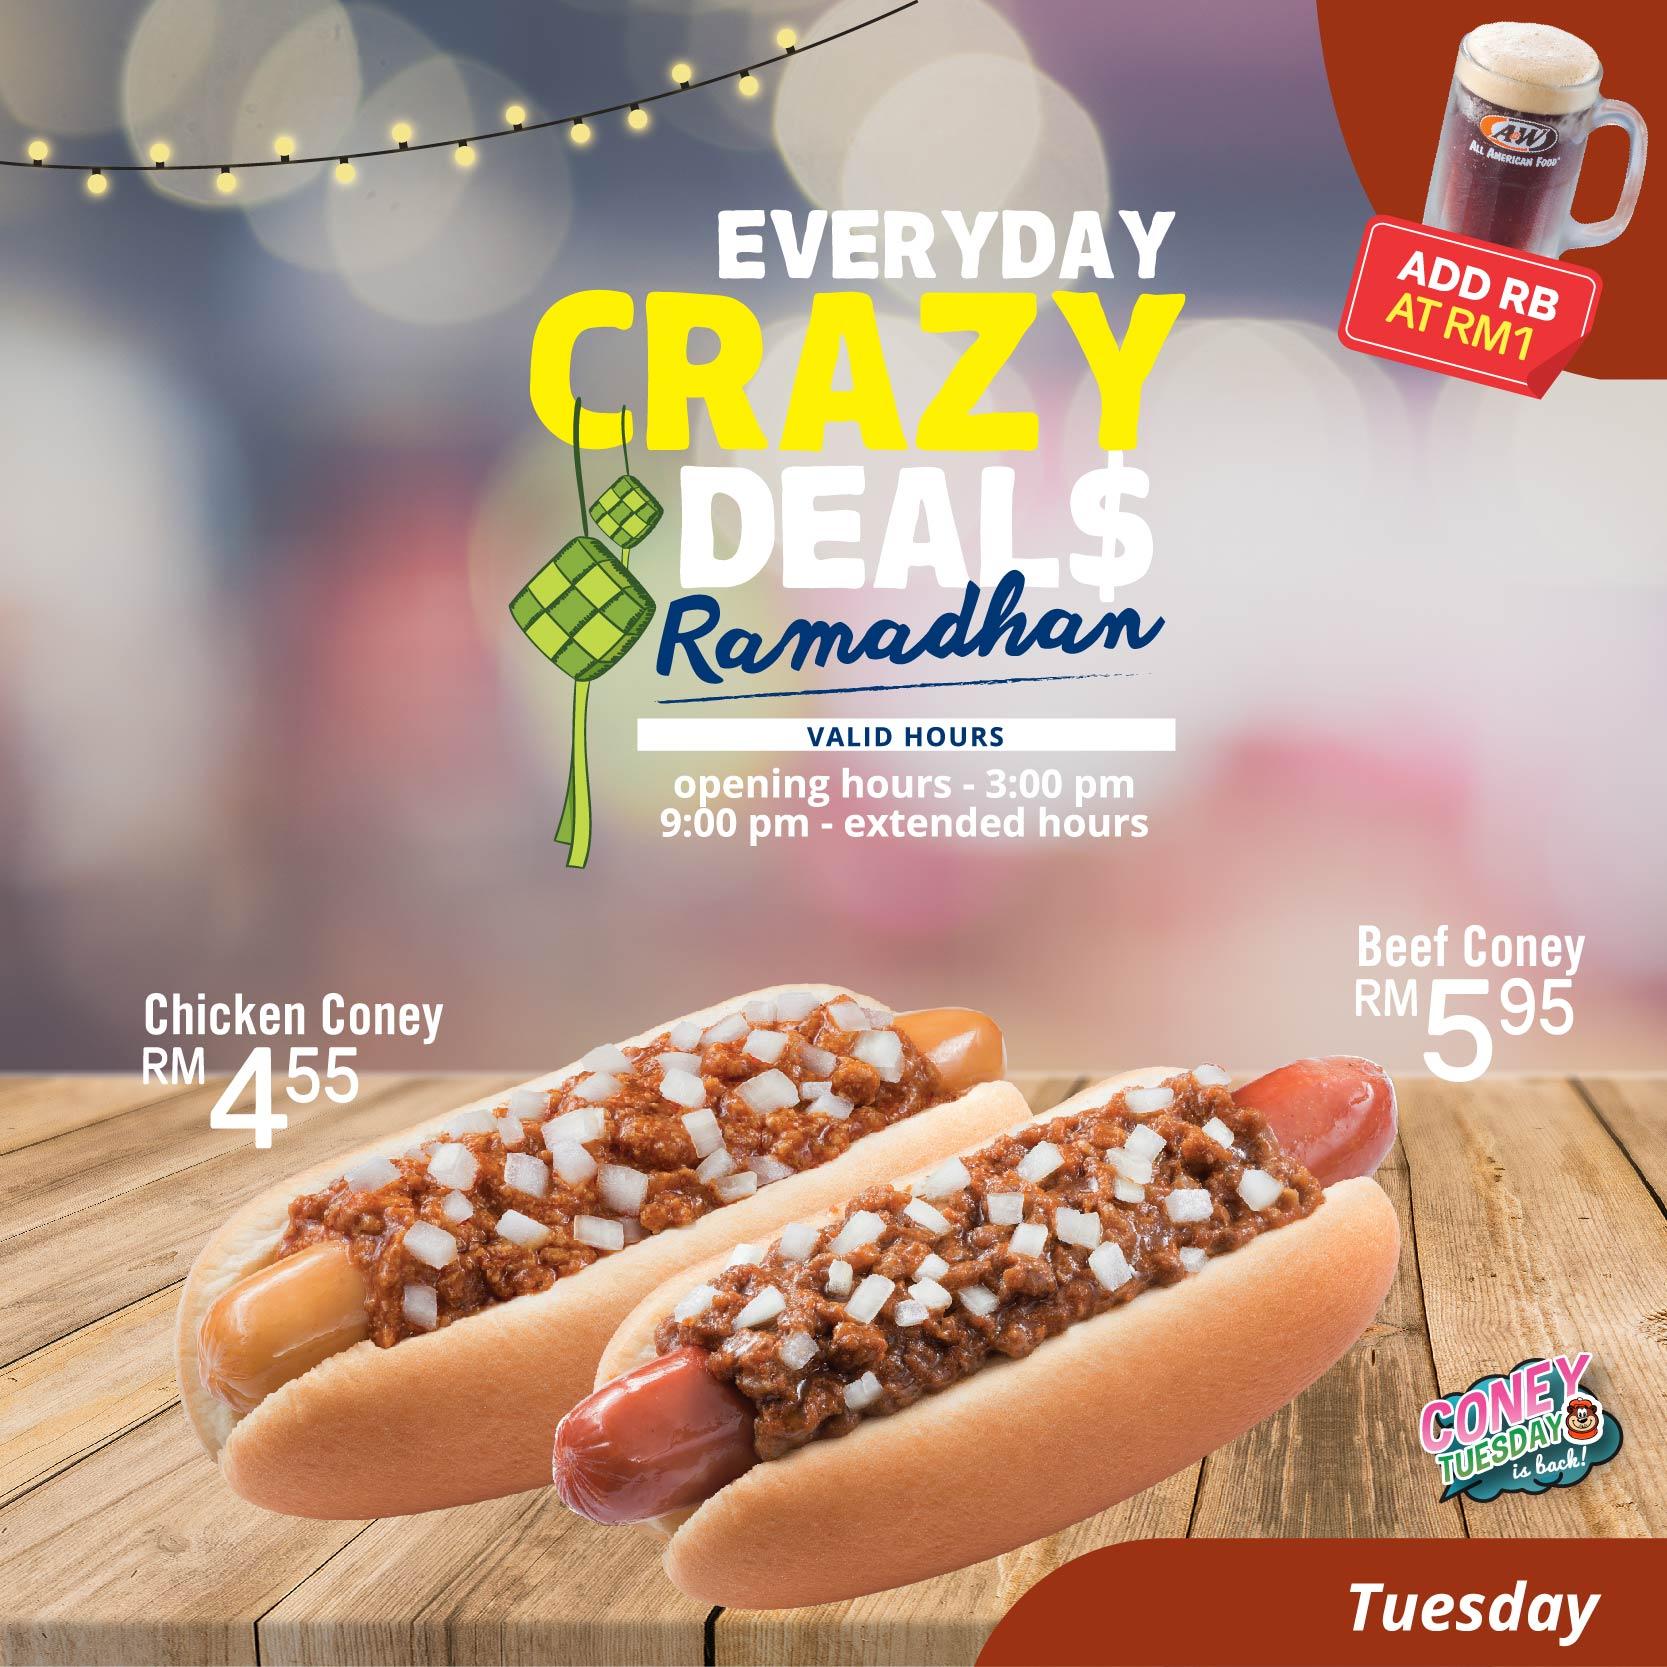 crazy deal coney ramadan-01-01.jpg